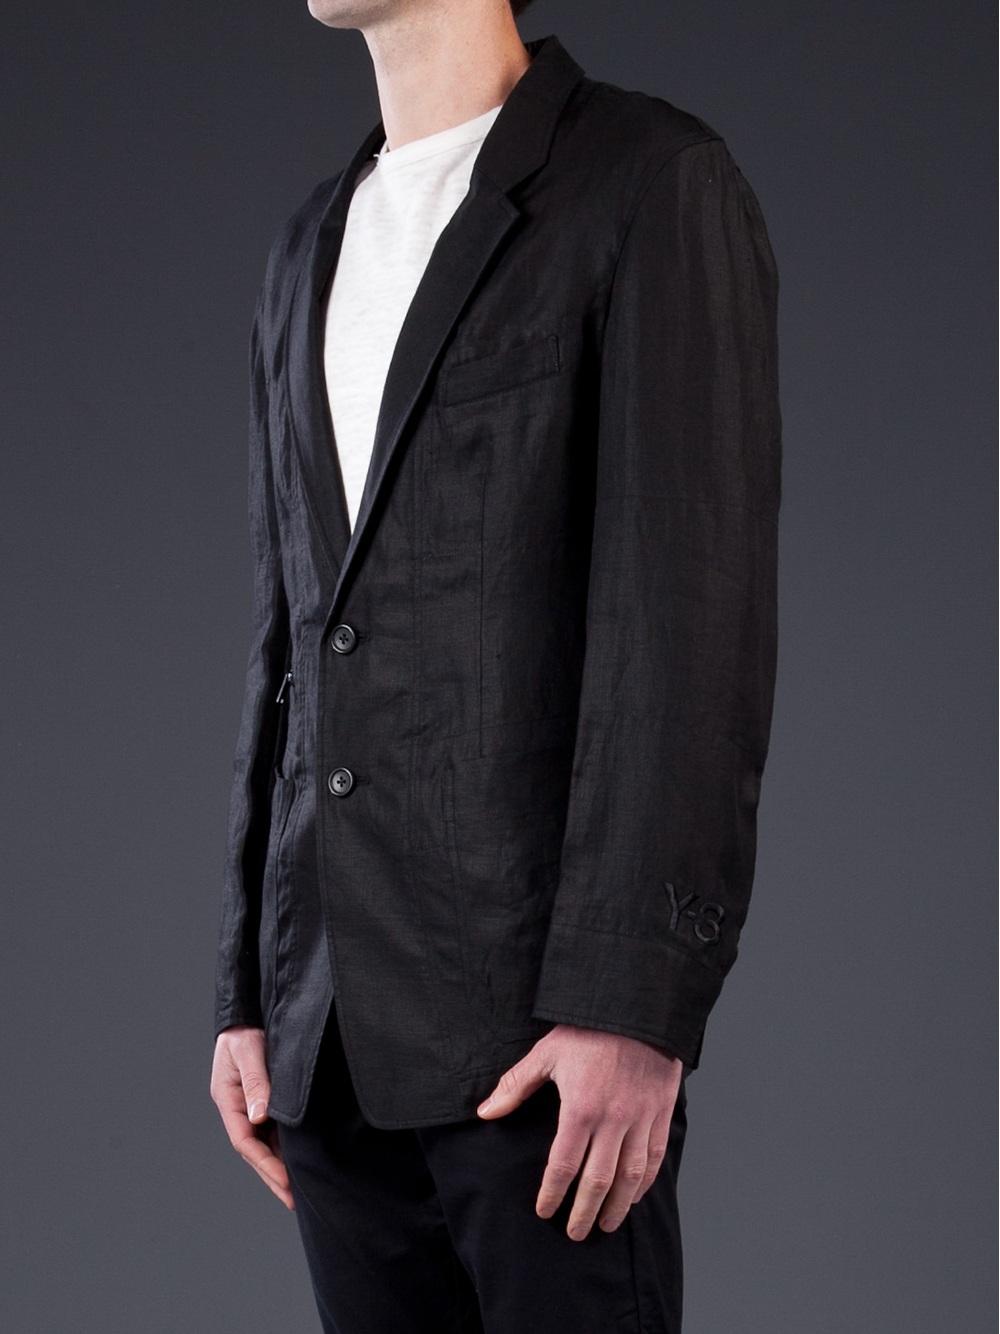 89f5527377d2 Y-3 Linen Blazer in Black for Men - Lyst